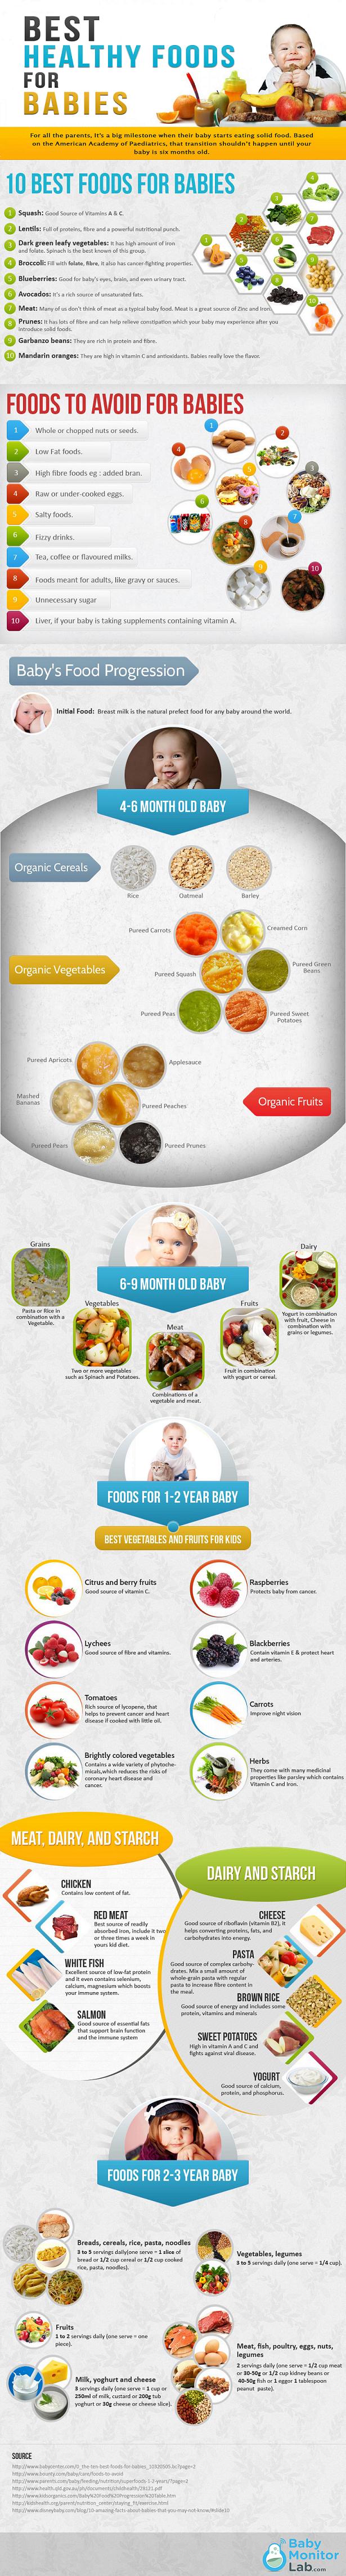 Healthy Baby Foods